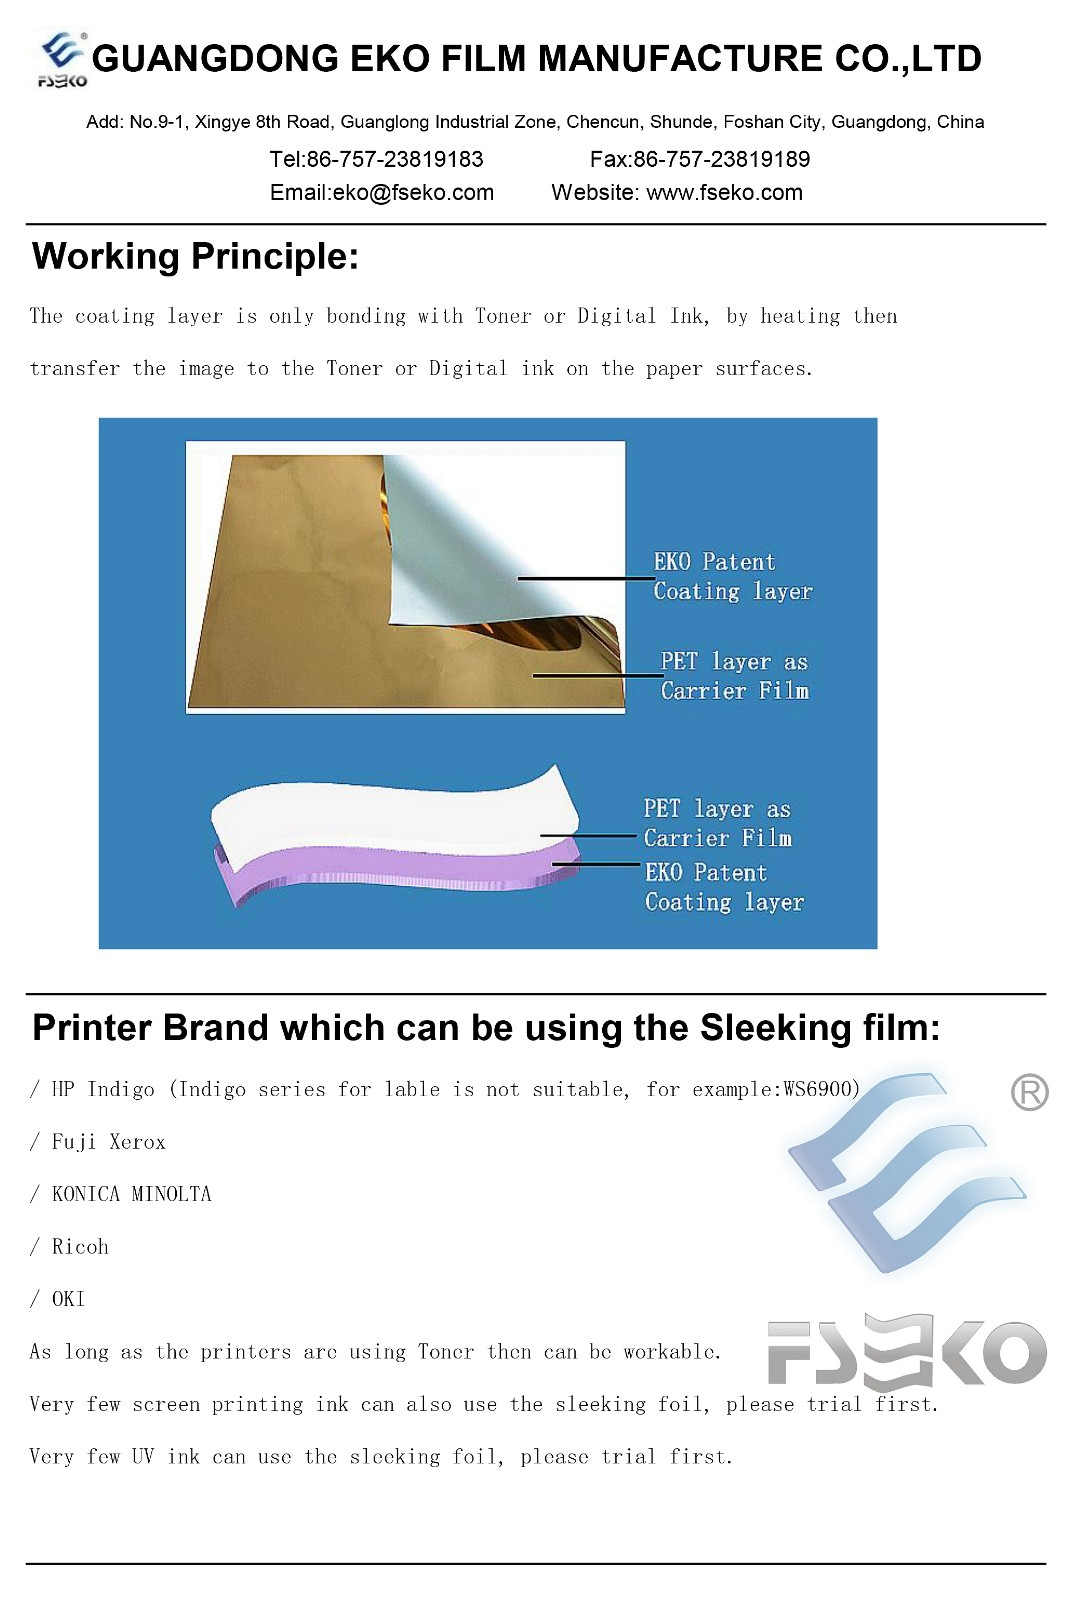 FSEKO-Metallized Polypropylene Film Capacitor-eko Digital Hot Sleeking Film Instruction-1